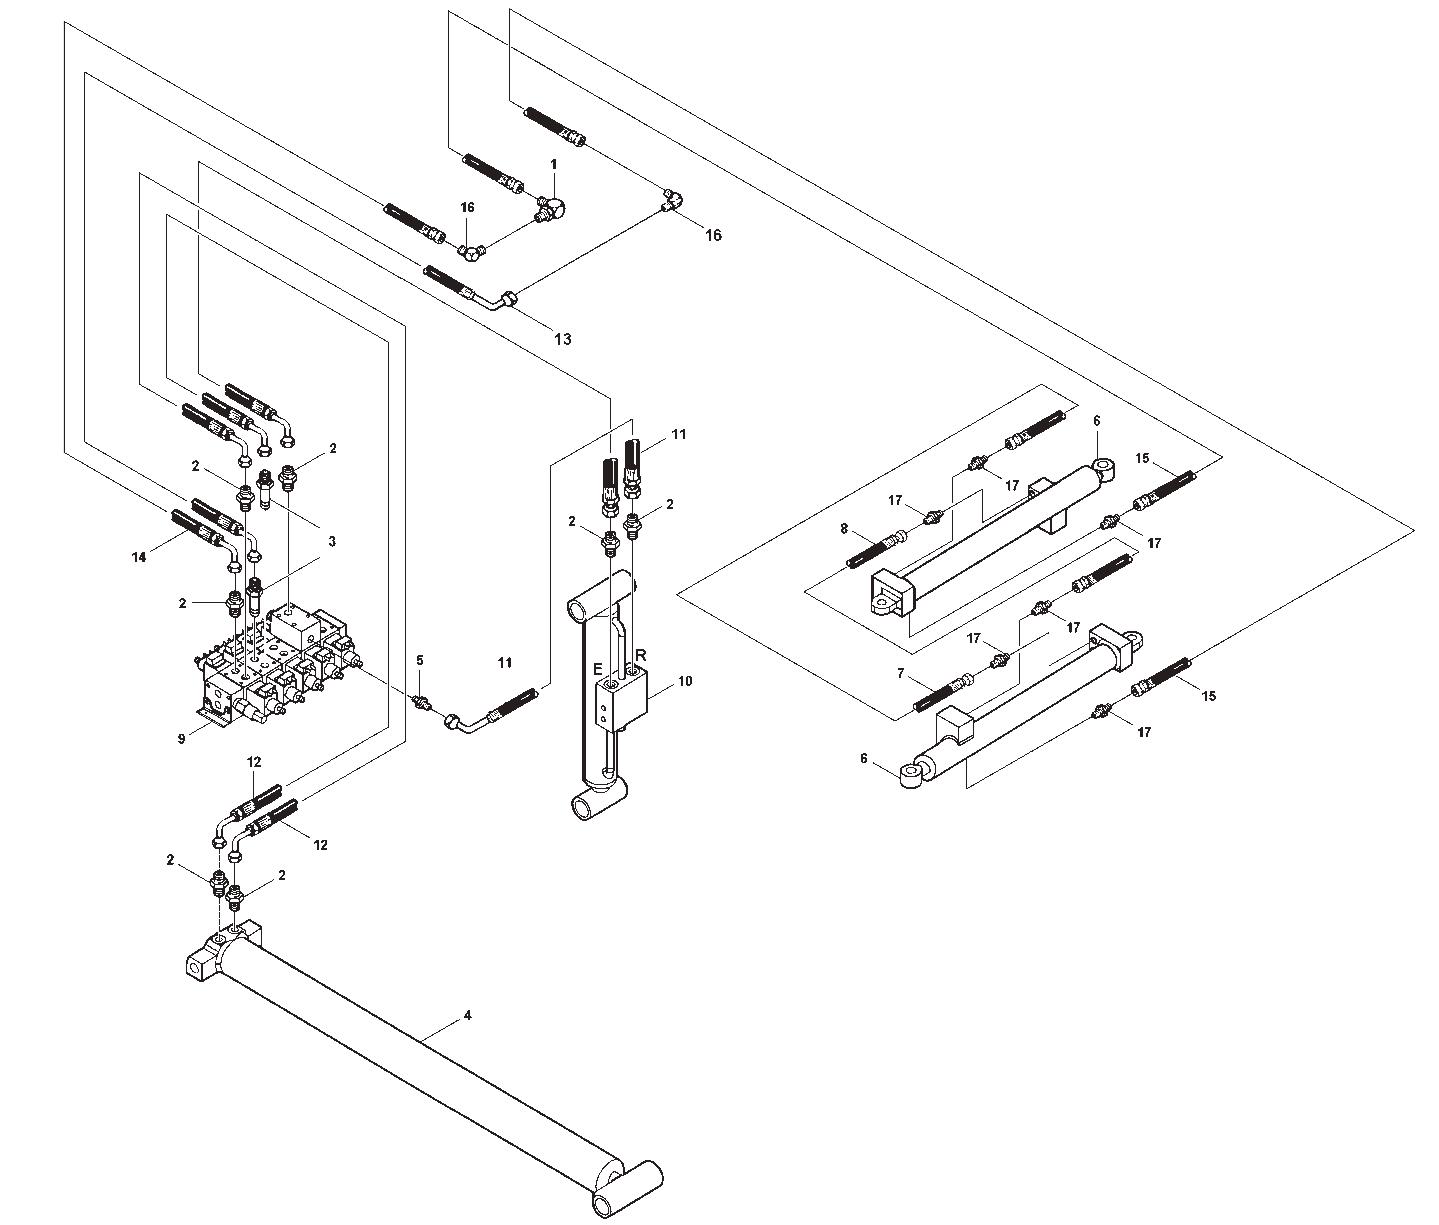 vulcan_810_intruder_05001073_06_2000 14?sfvrsn\=eab79936_0 vulcan 810 intruder wiring diagram vulcan 810 power tilt  at readyjetset.co